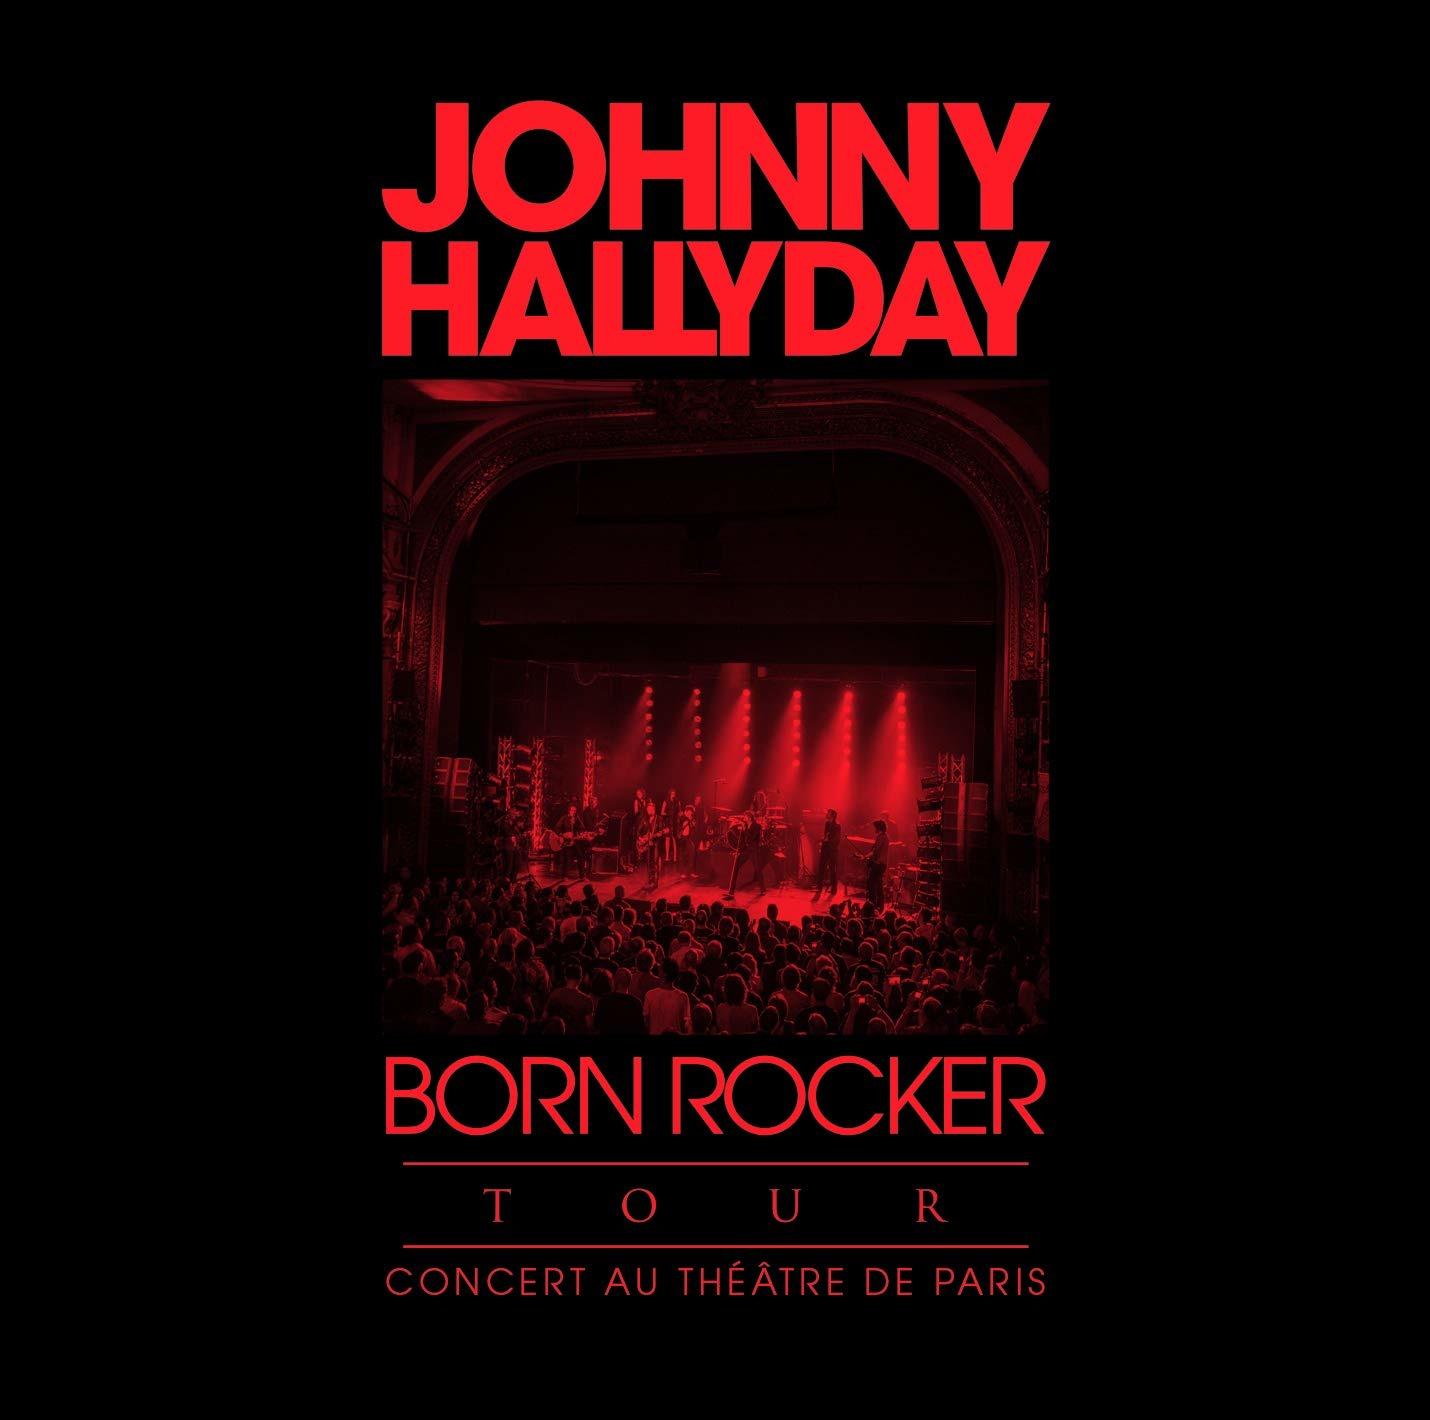 CD HALLYDAY, JOHNNY - BORN ROCKER TOUR - THEATRE DE PARIS